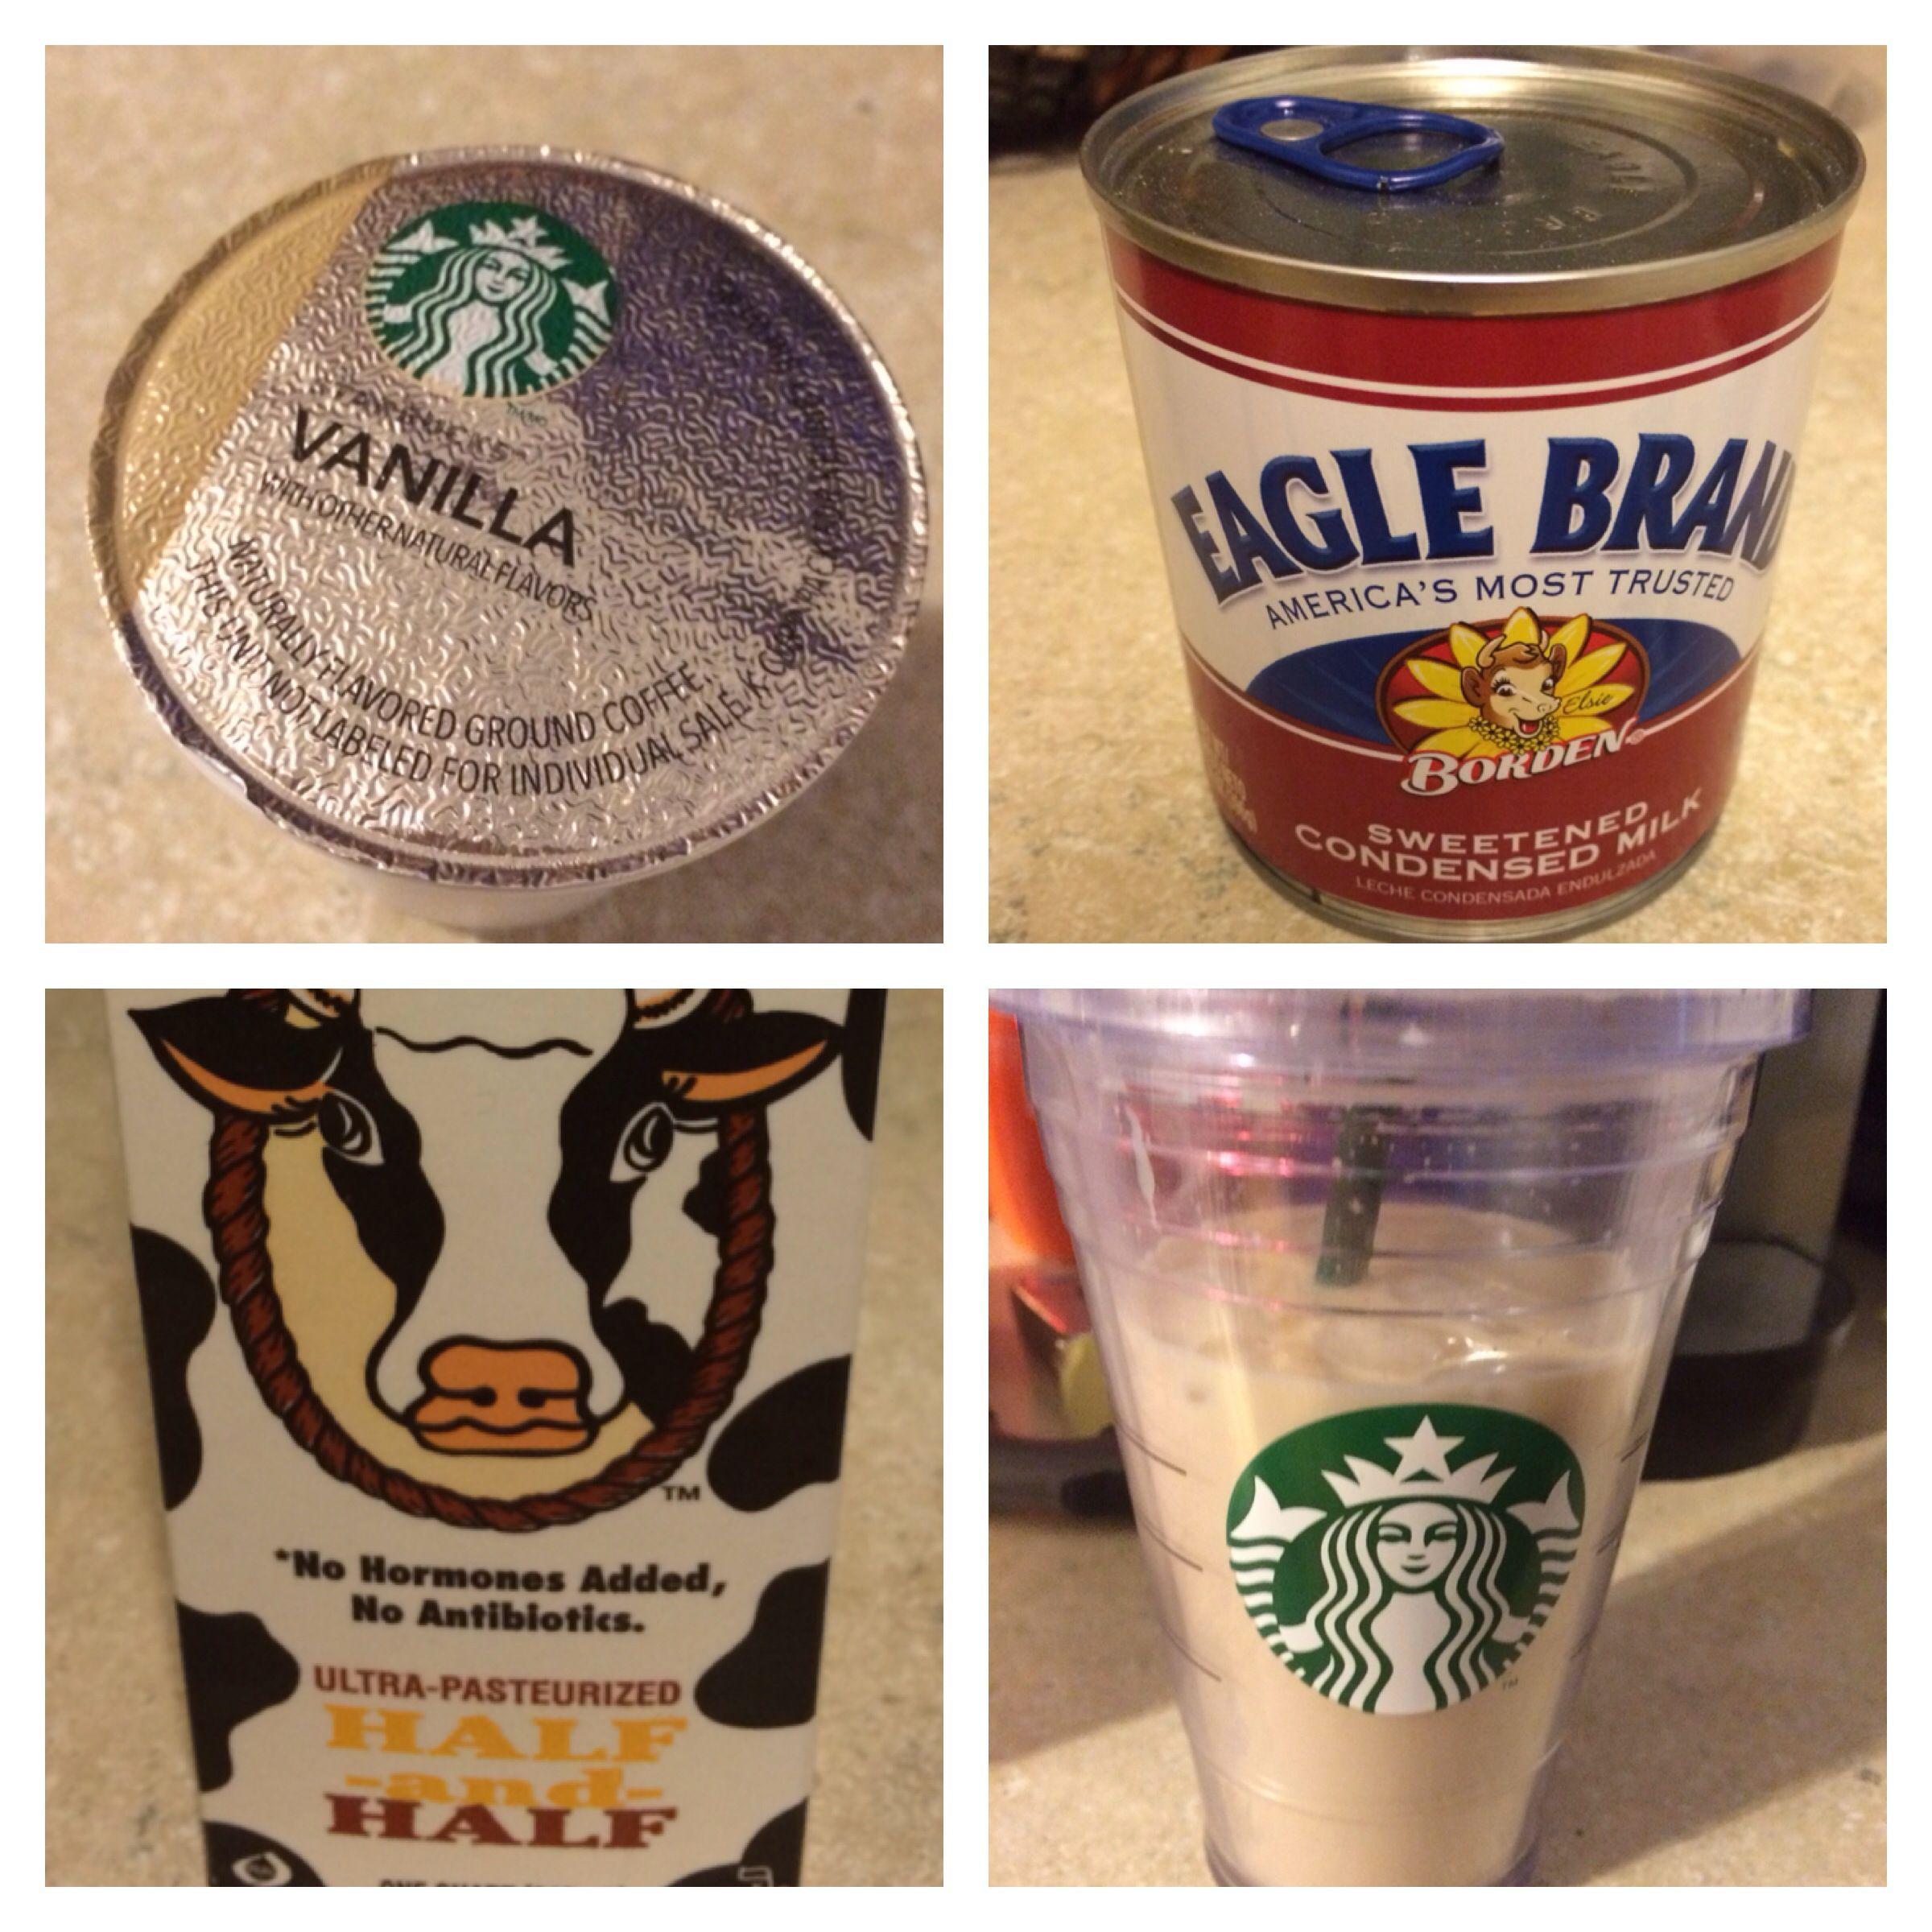 6 marvelous tricks coffee pictures aesthetic coffee meme